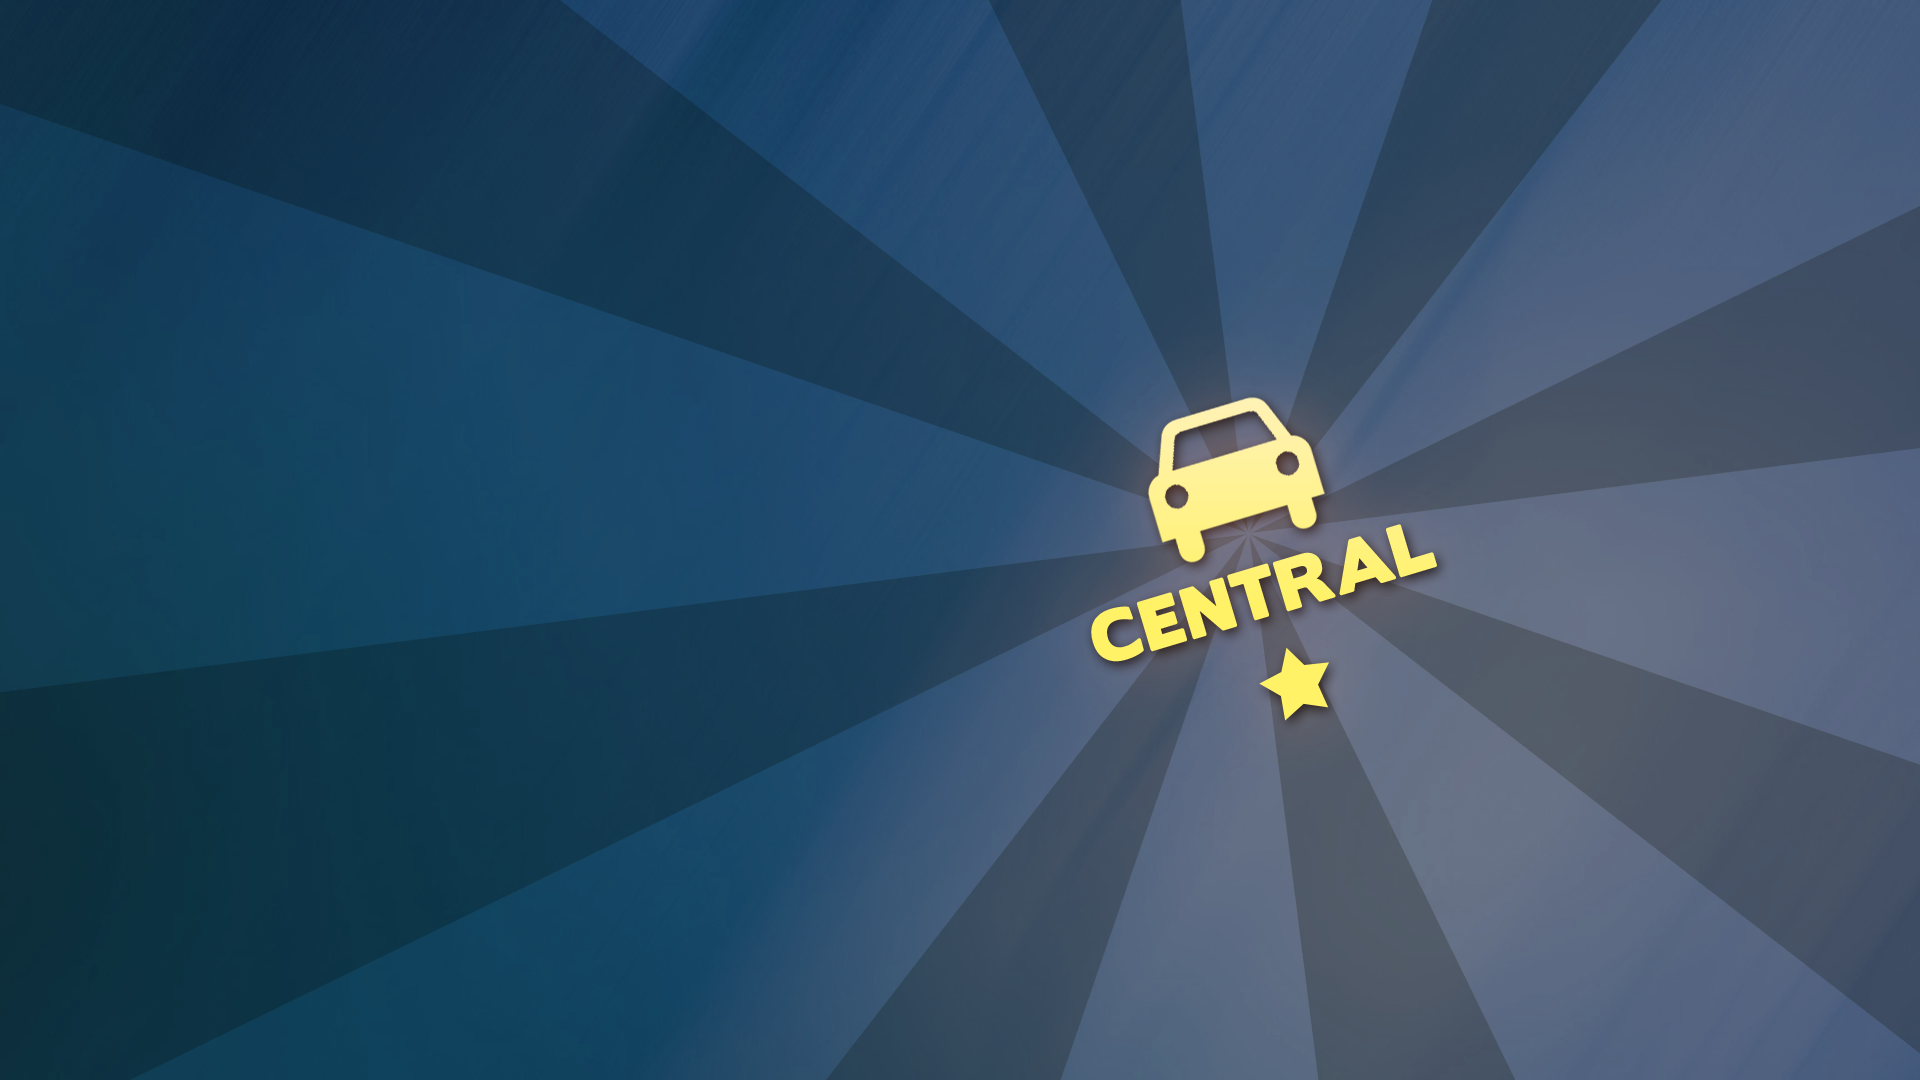 Car insignia 'Central'